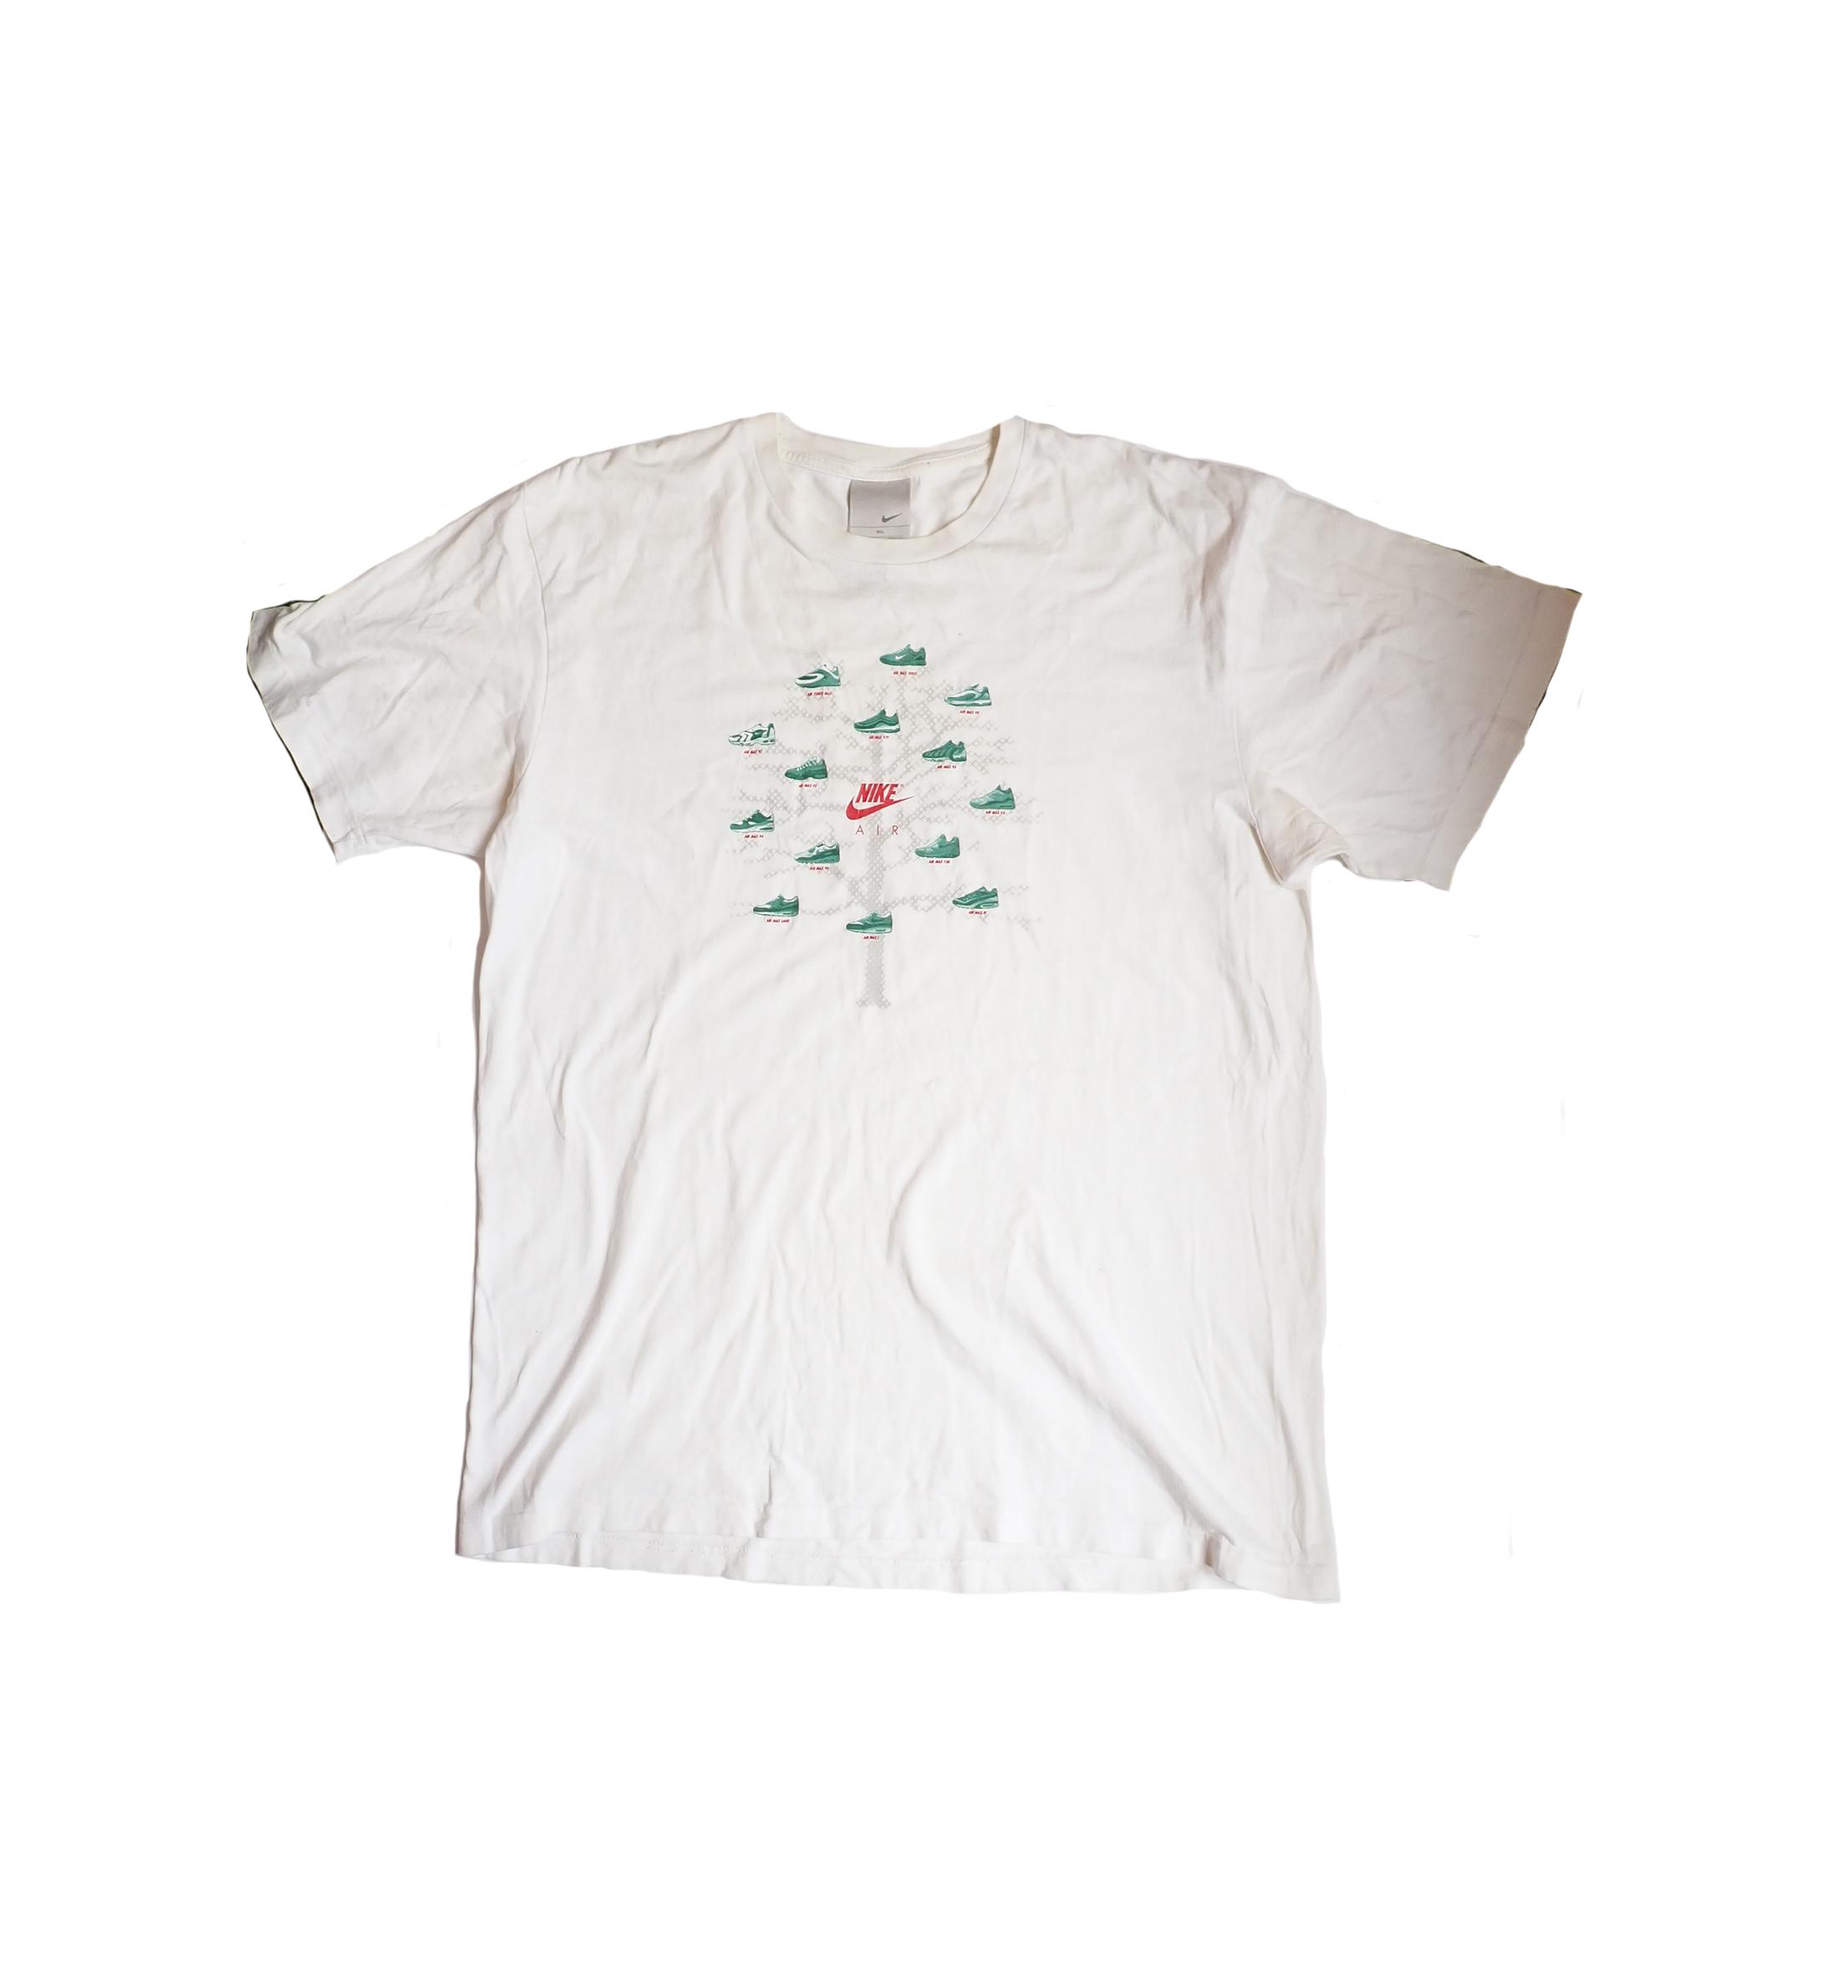 Nike Air T-shirt Vintage